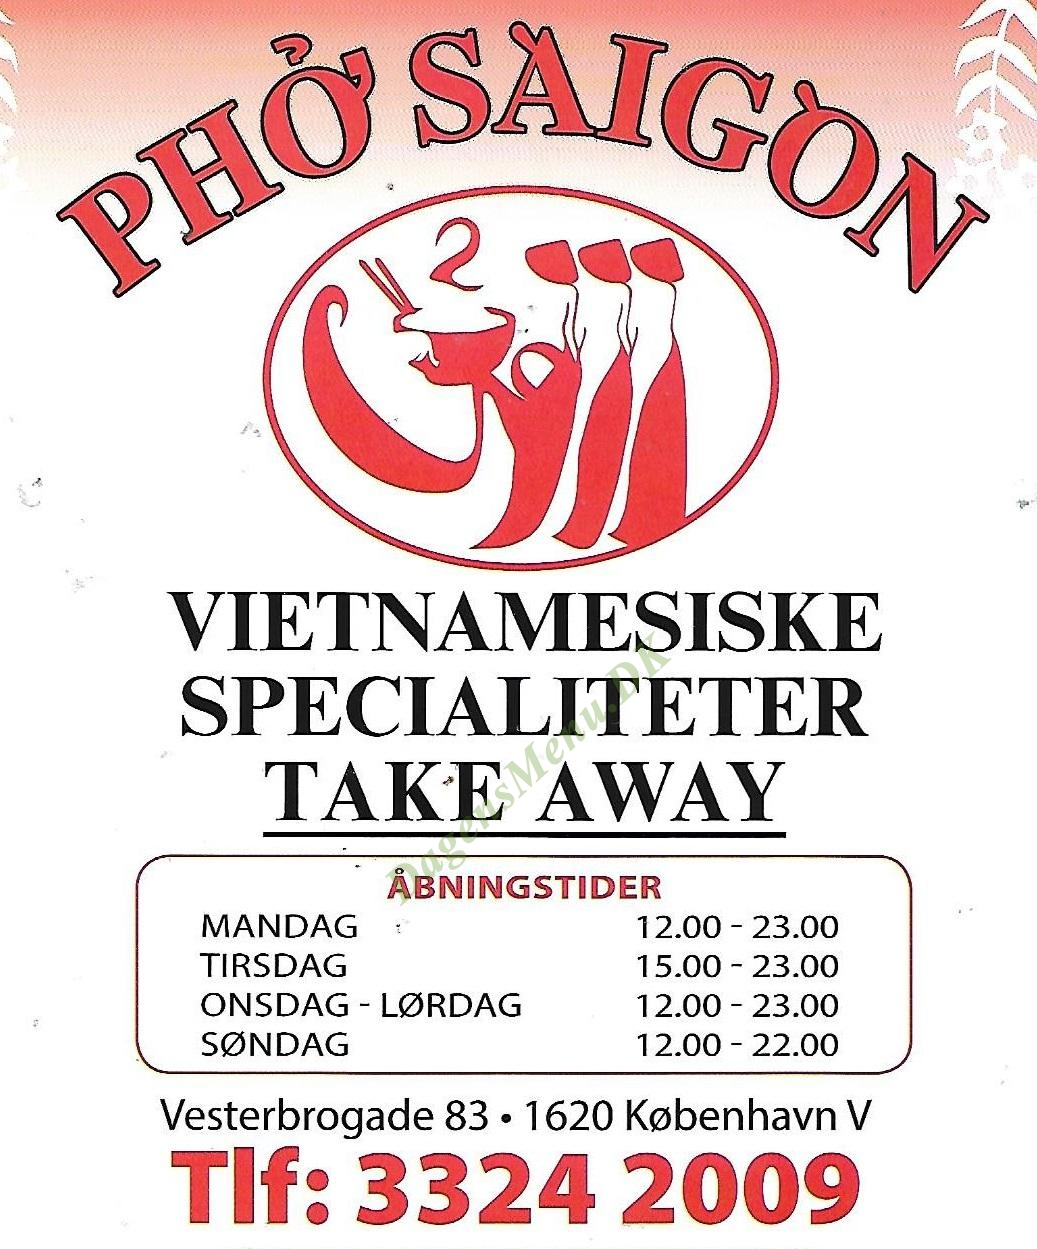 Pho Saigon - Menukort